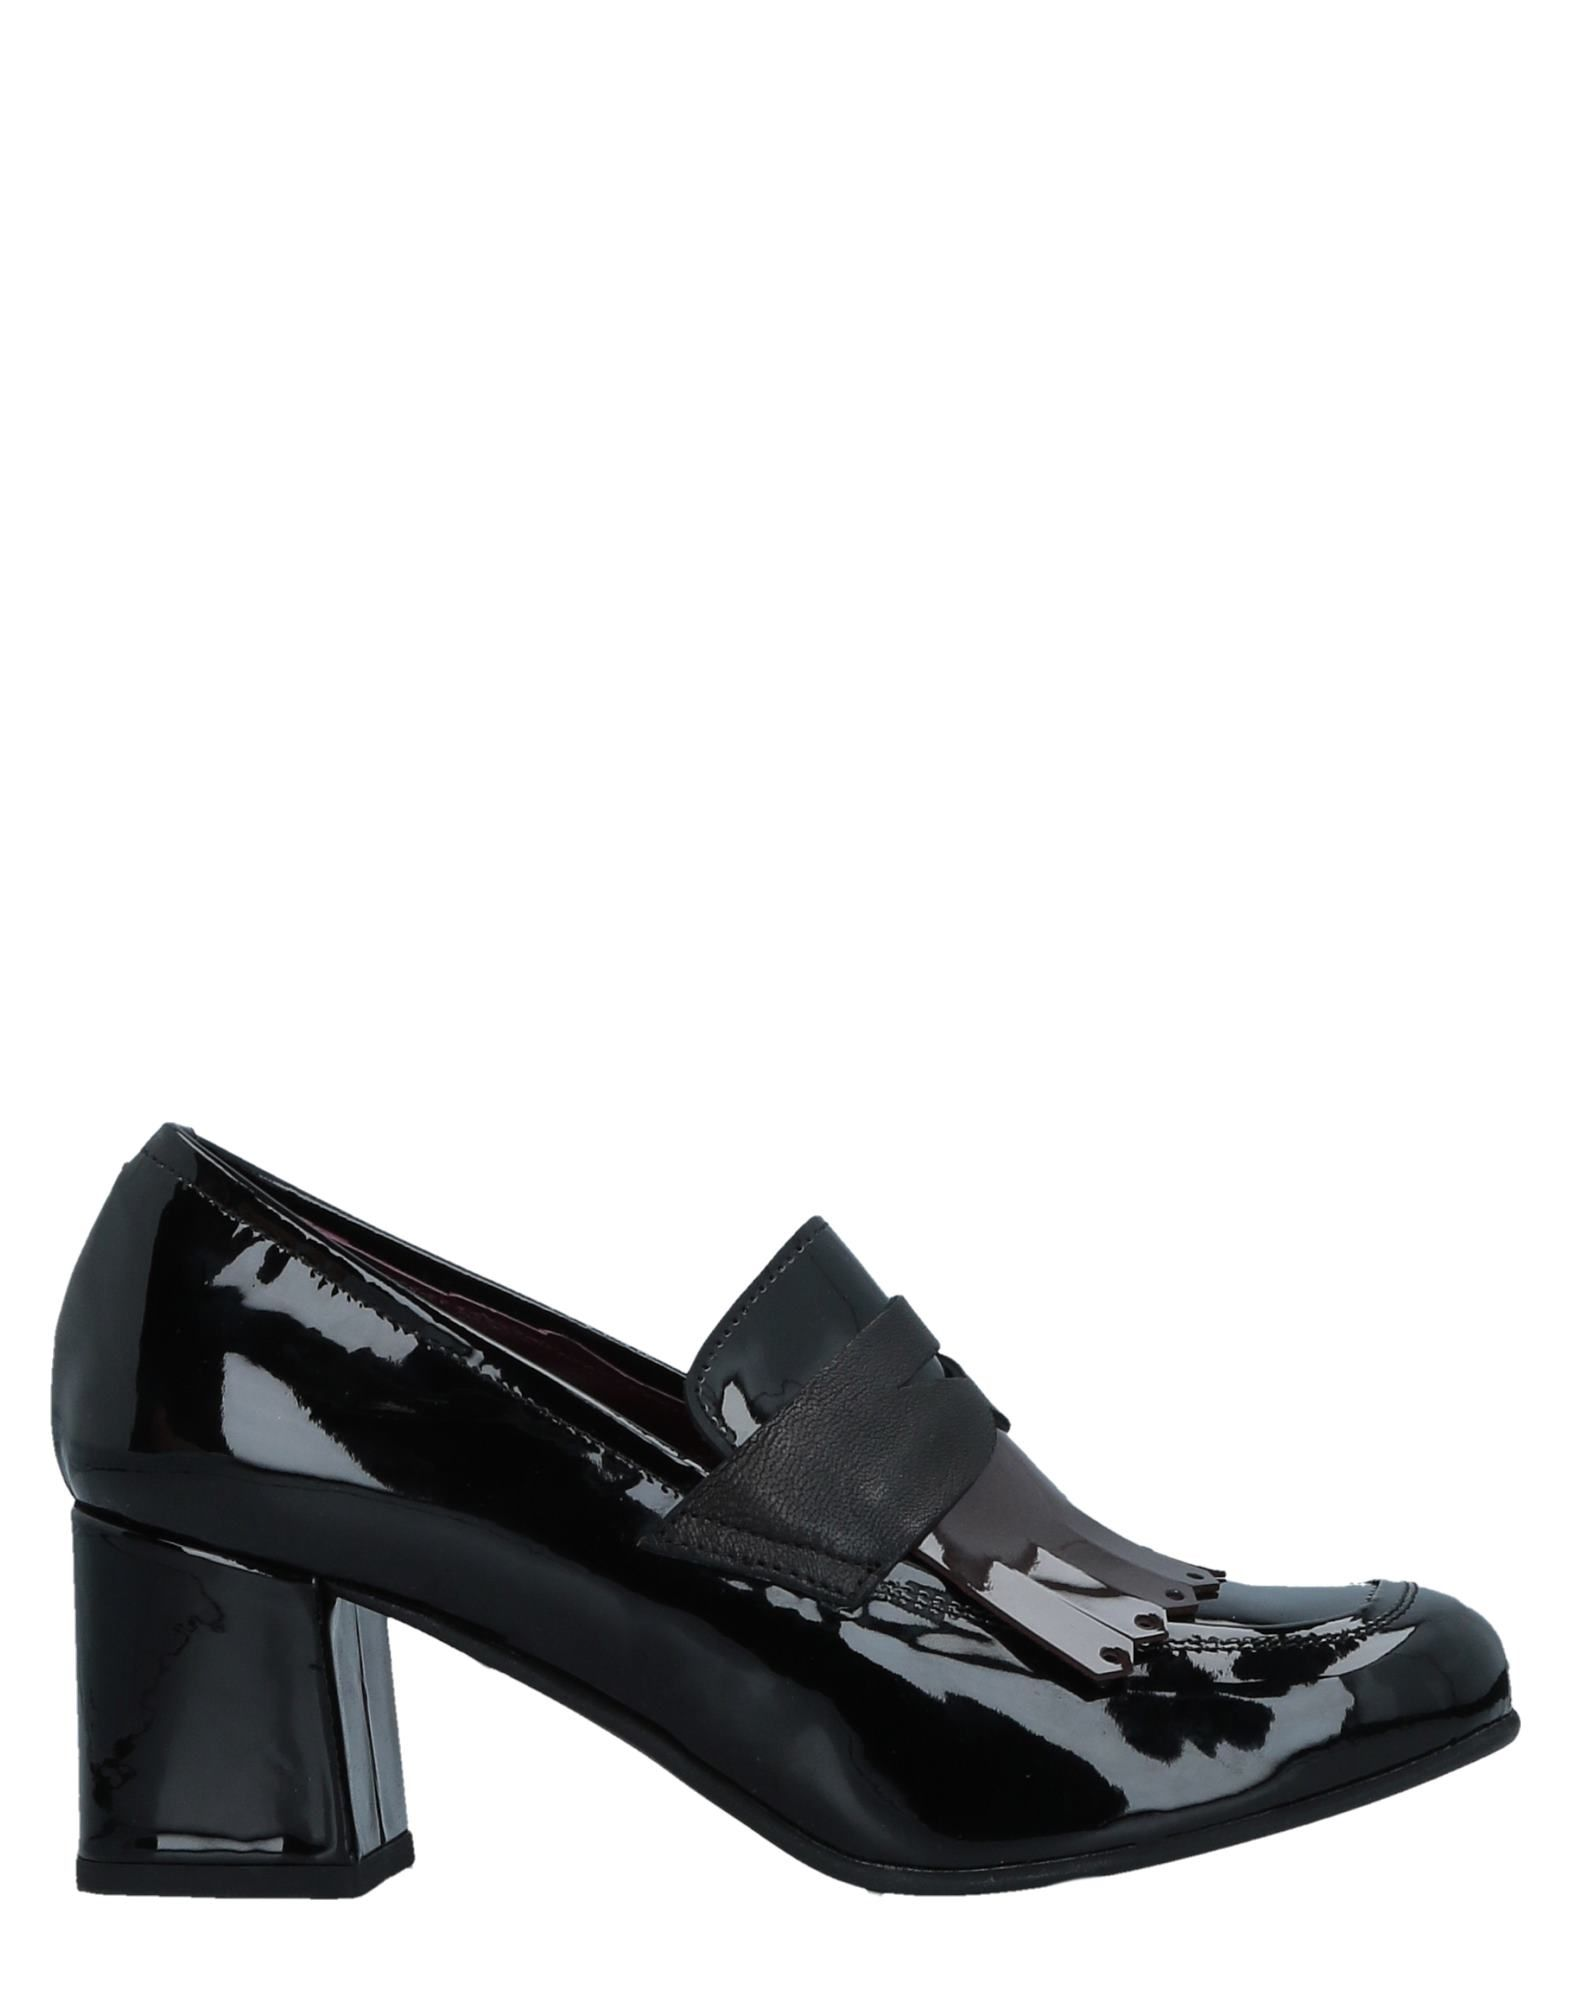 Le Sabot Loafers Loafers - Women Le Sabot Loafers Loafers online on  Australia - 11520123DJ 07e3b4